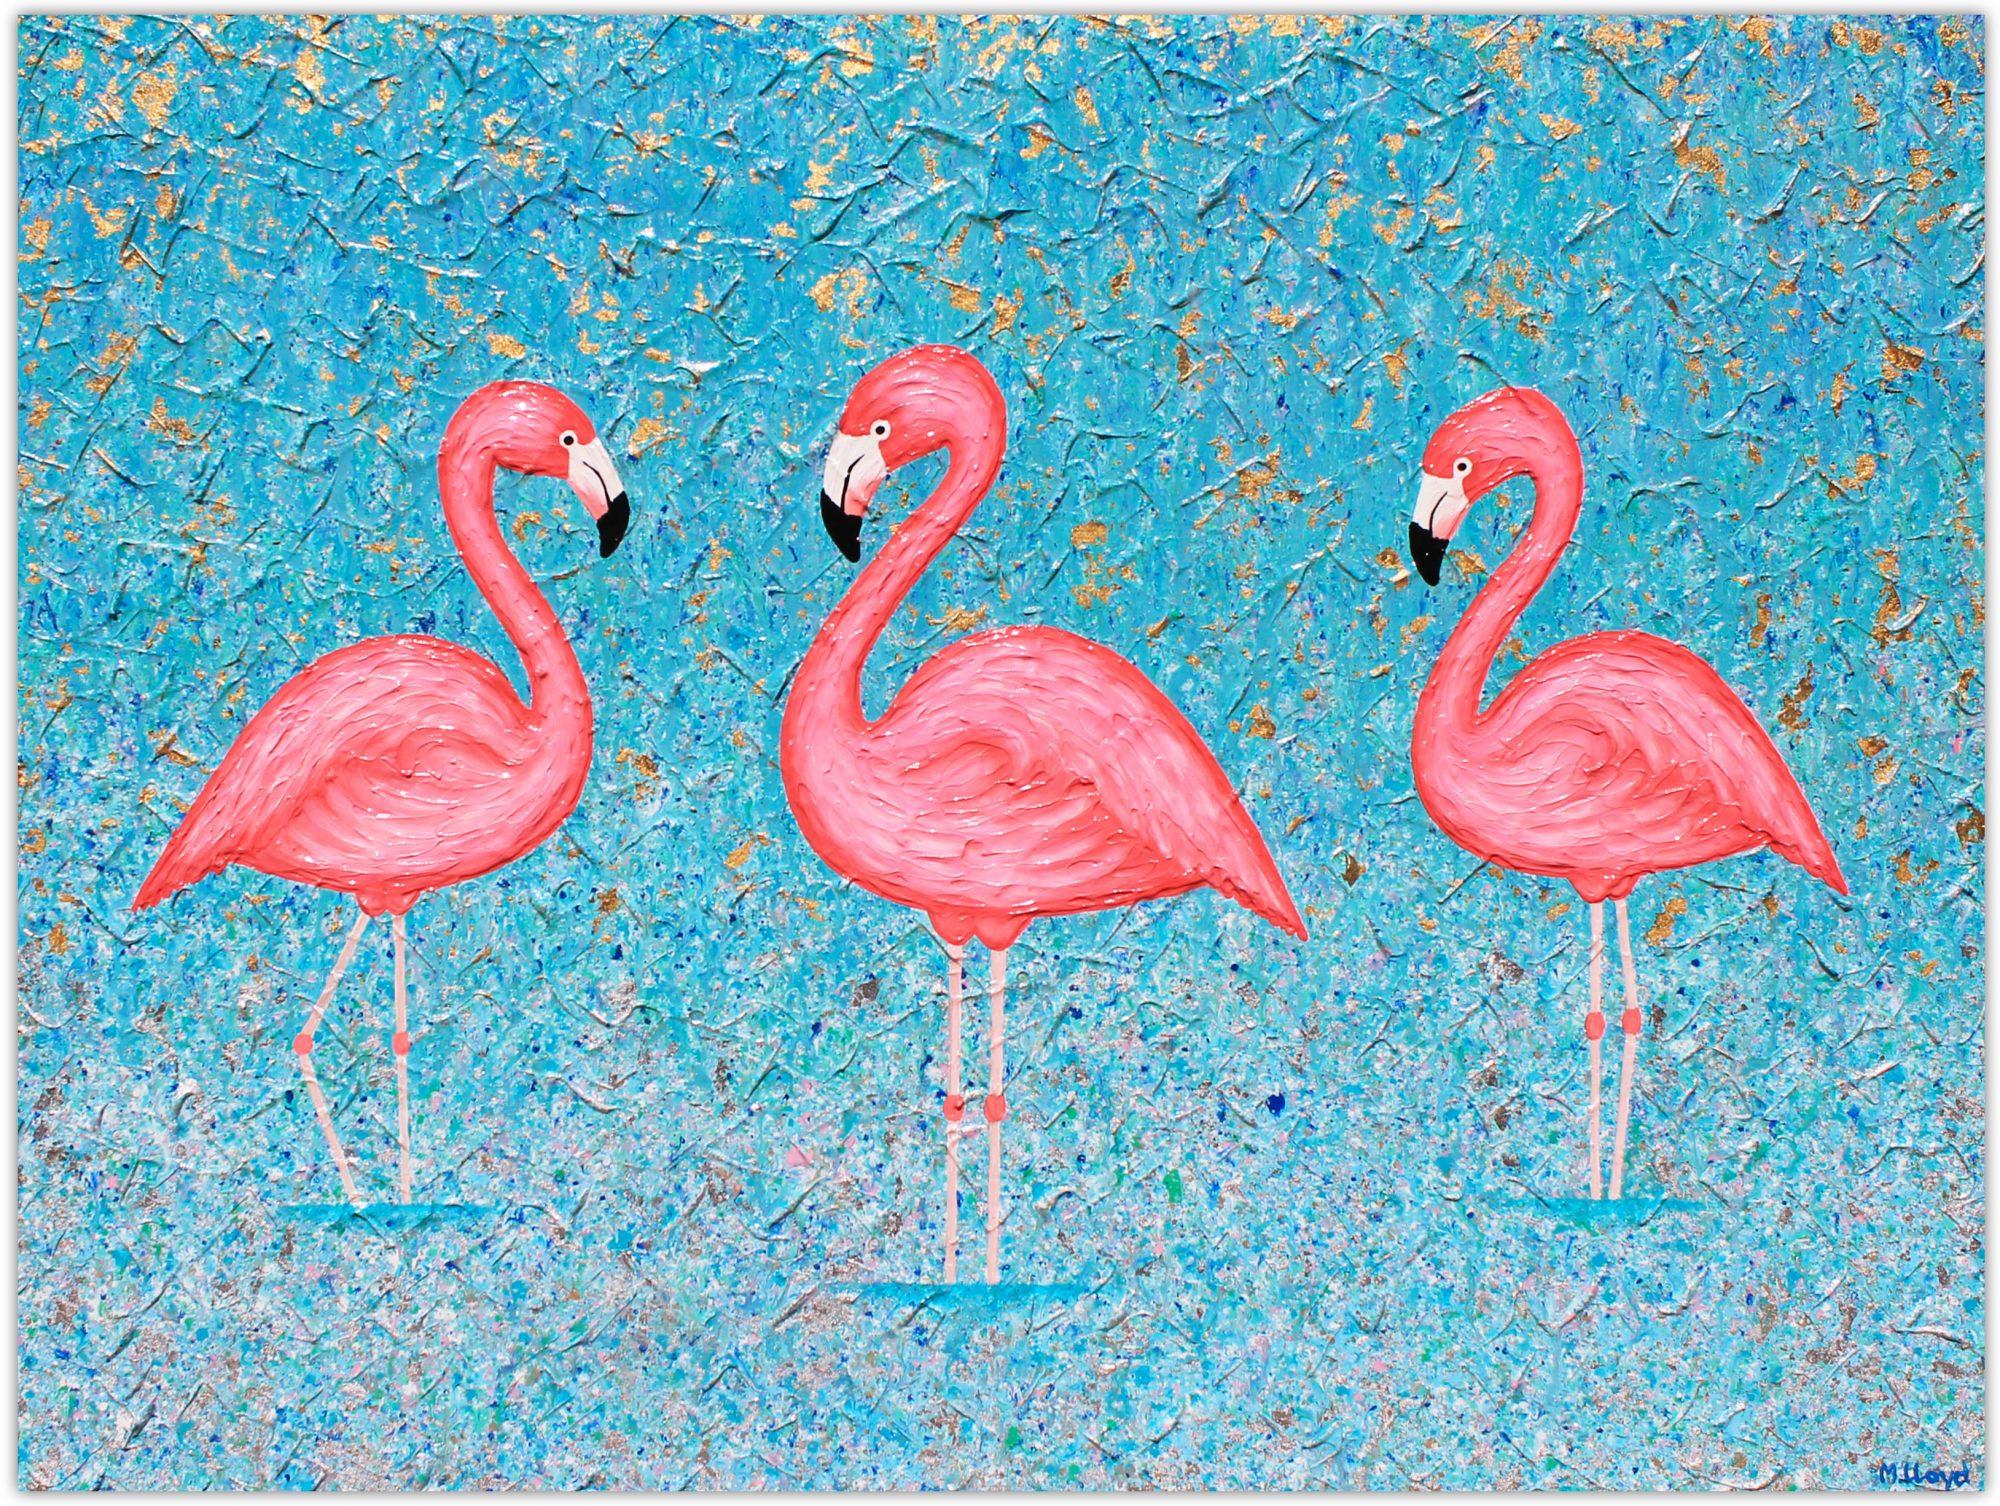 Flamingos Miranda Lloyd Artist South Australia 2019